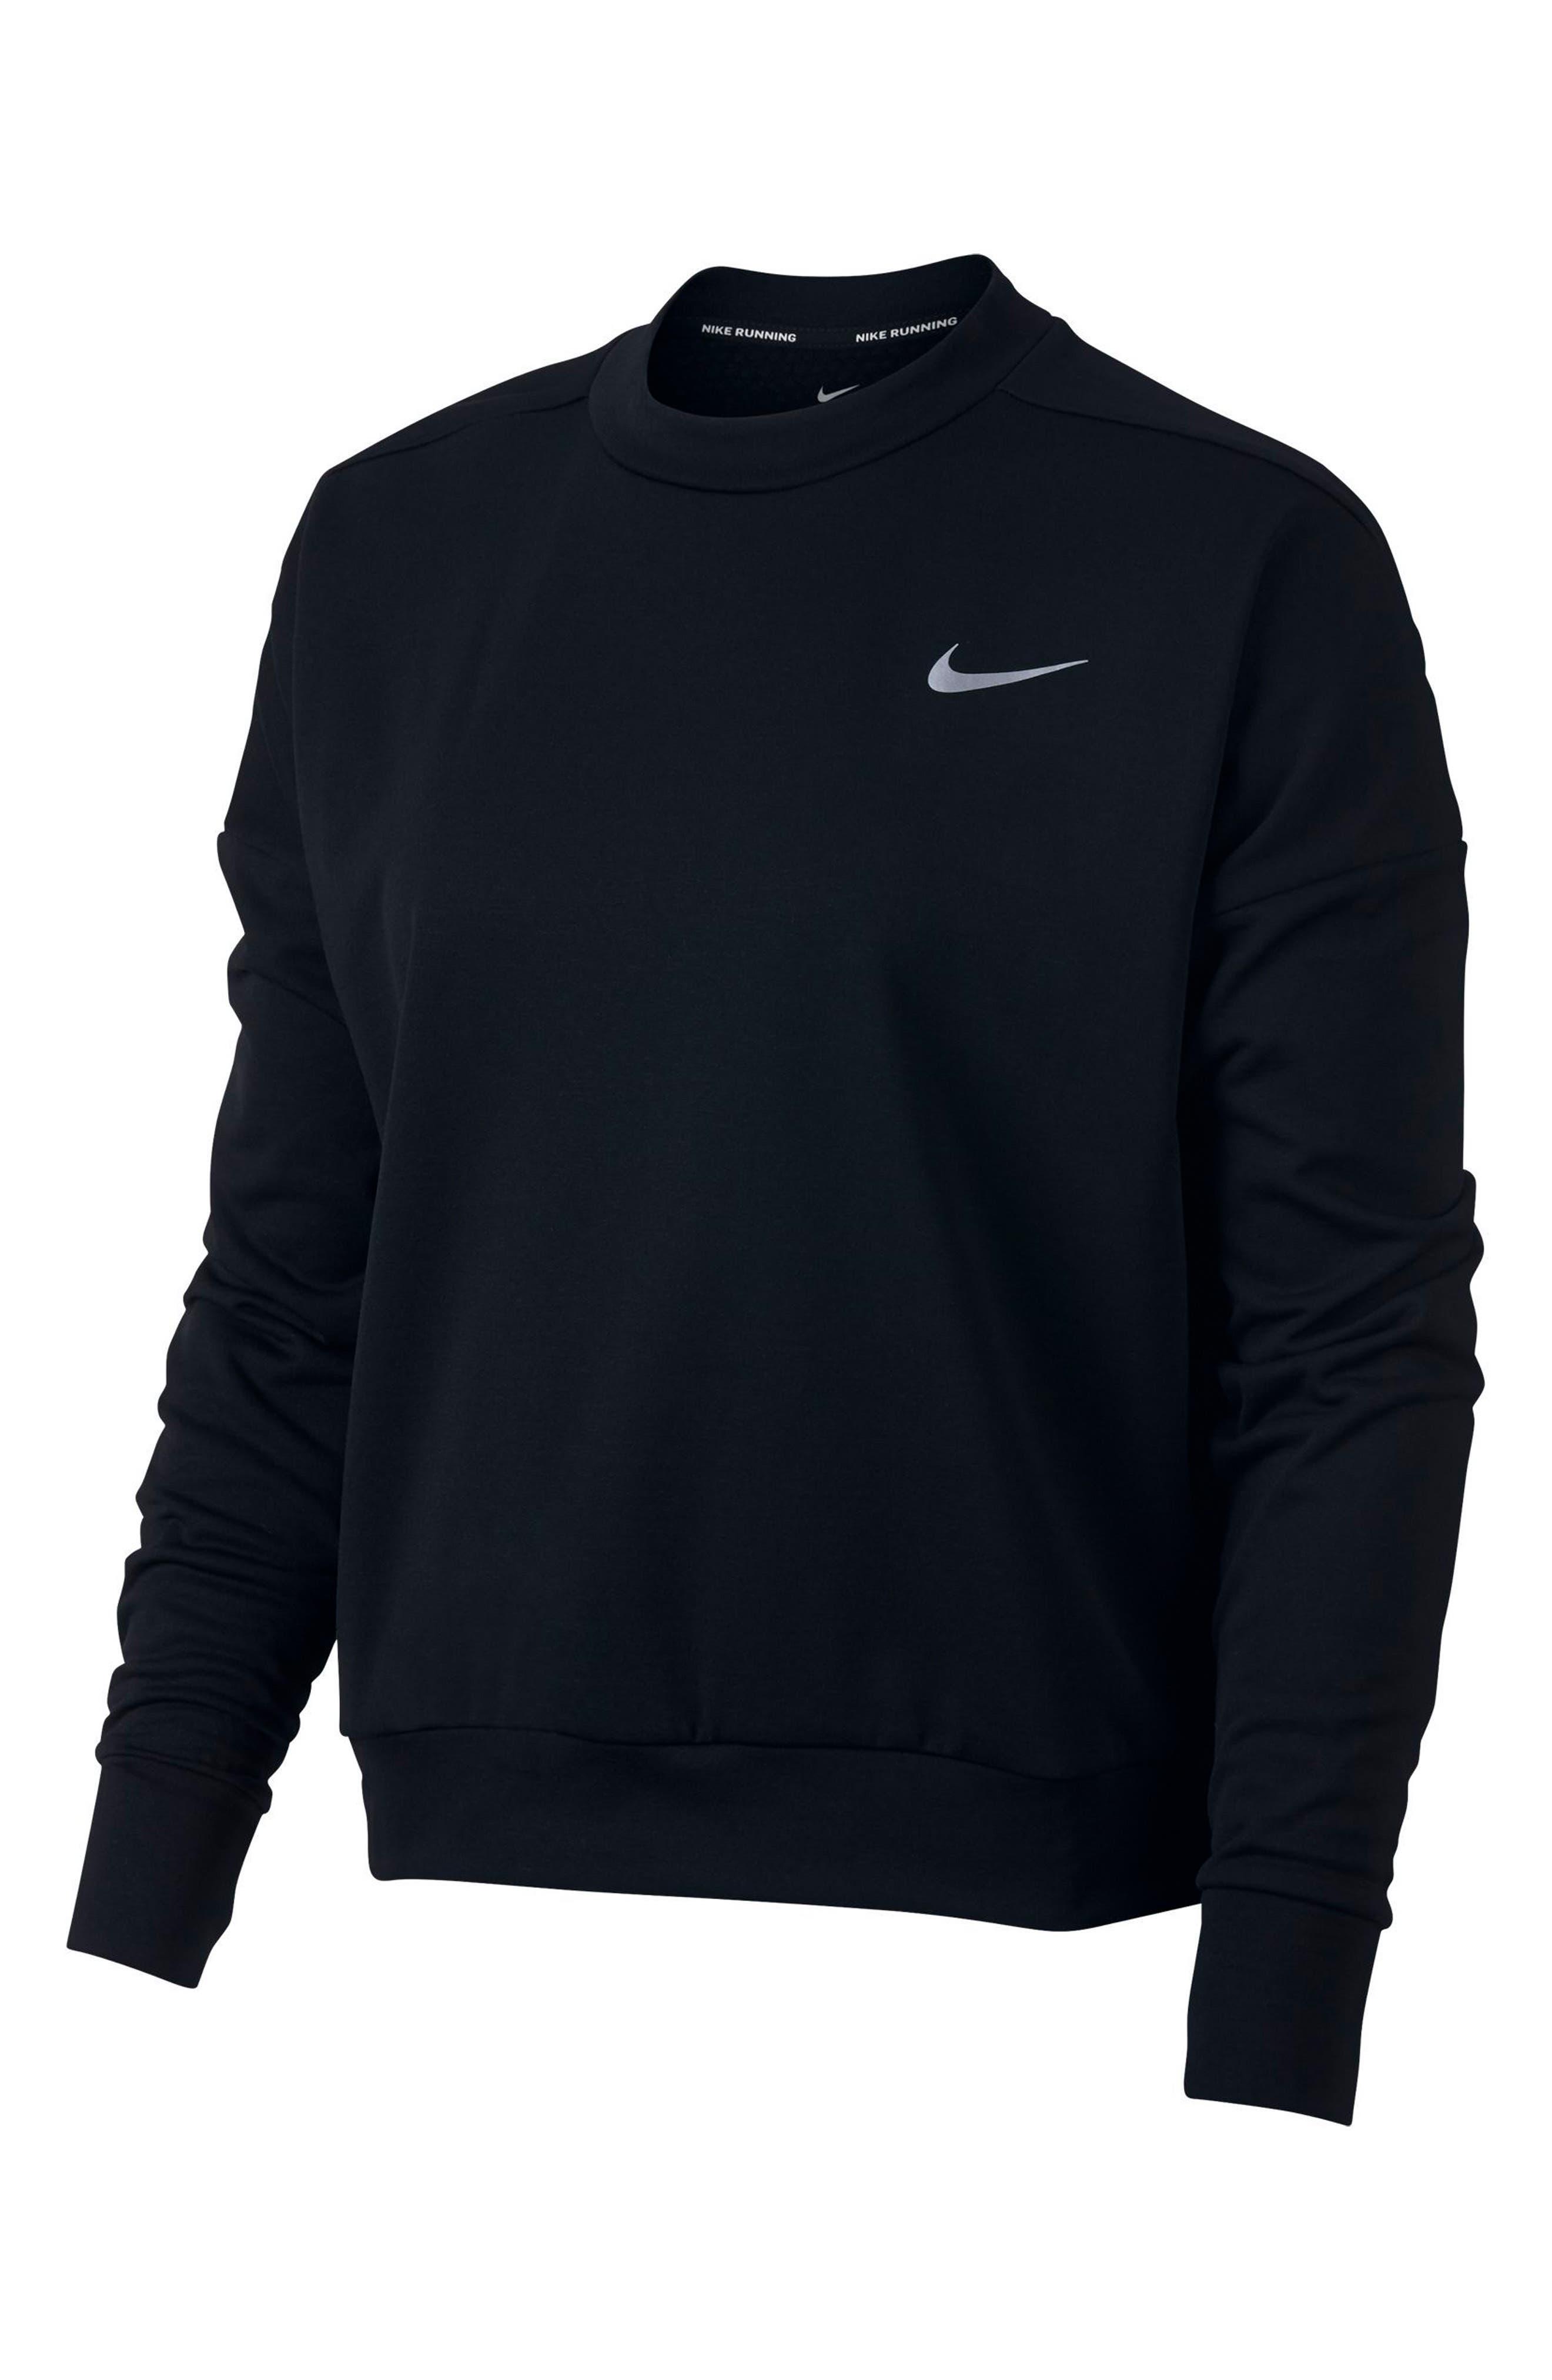 Main Image - Nike Therma Sphere Element Women's Running Top